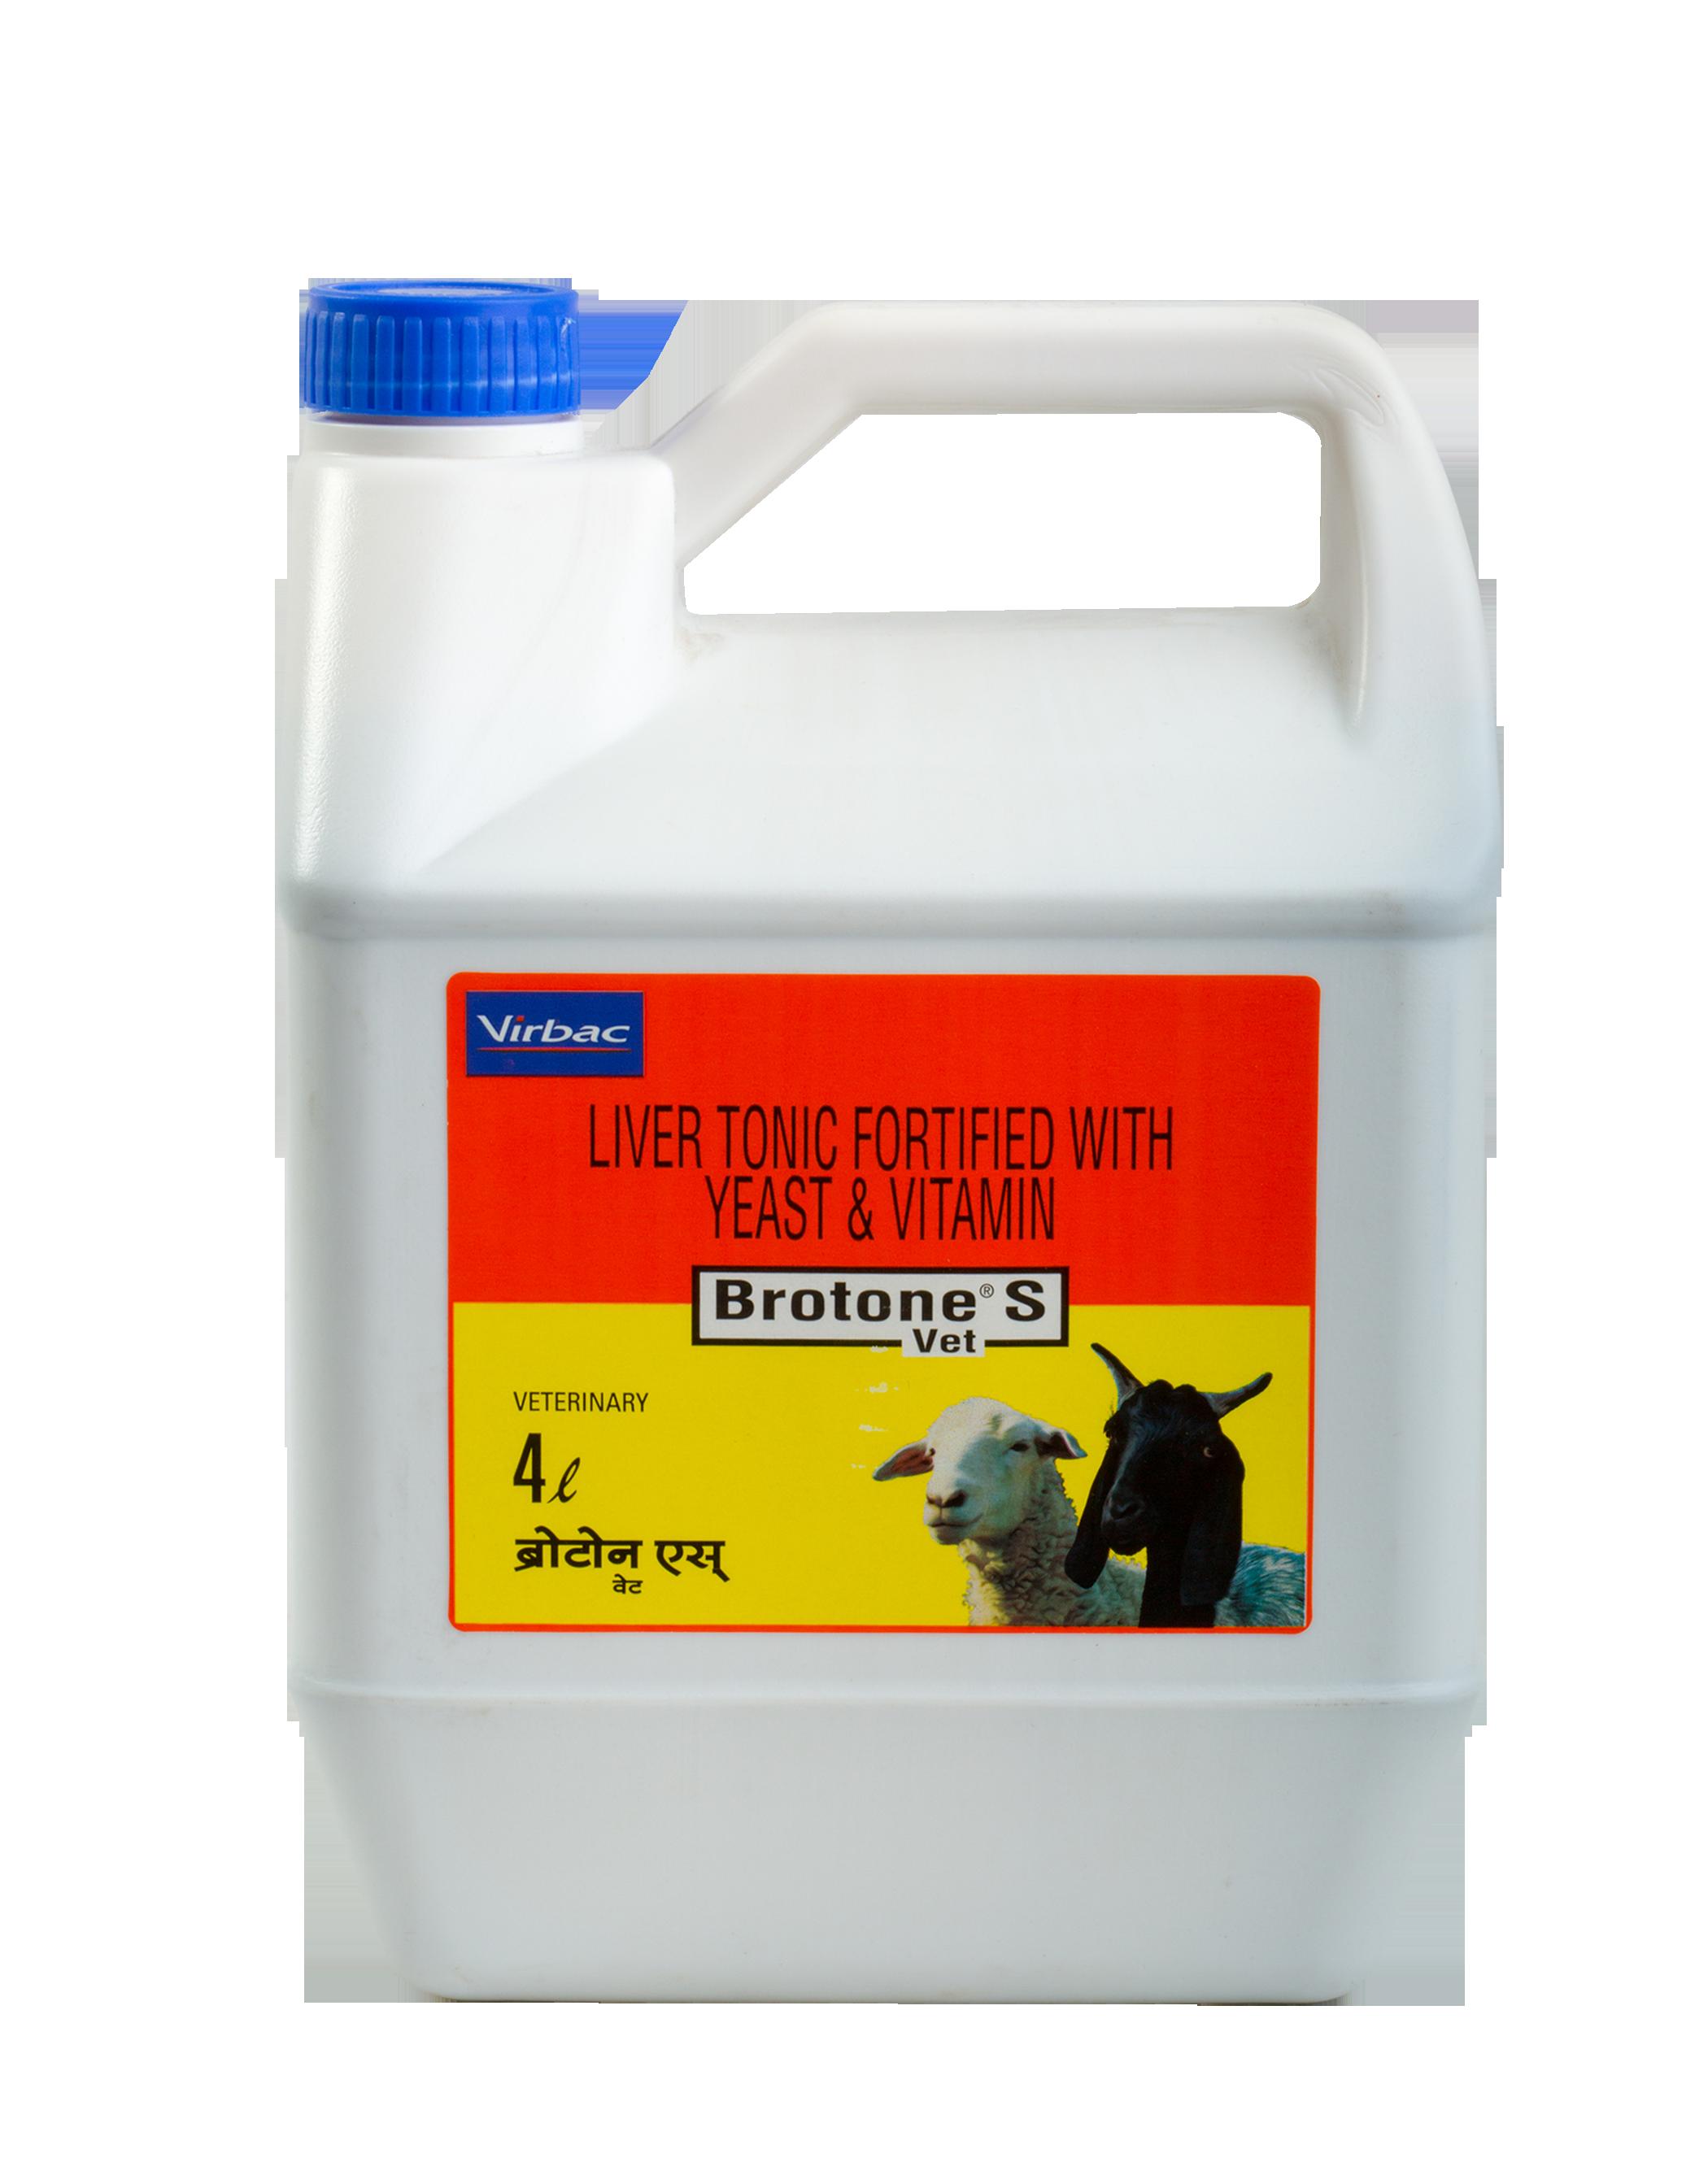 BROTONE S - Sheep and Goat Liver Tonic | Virbac India